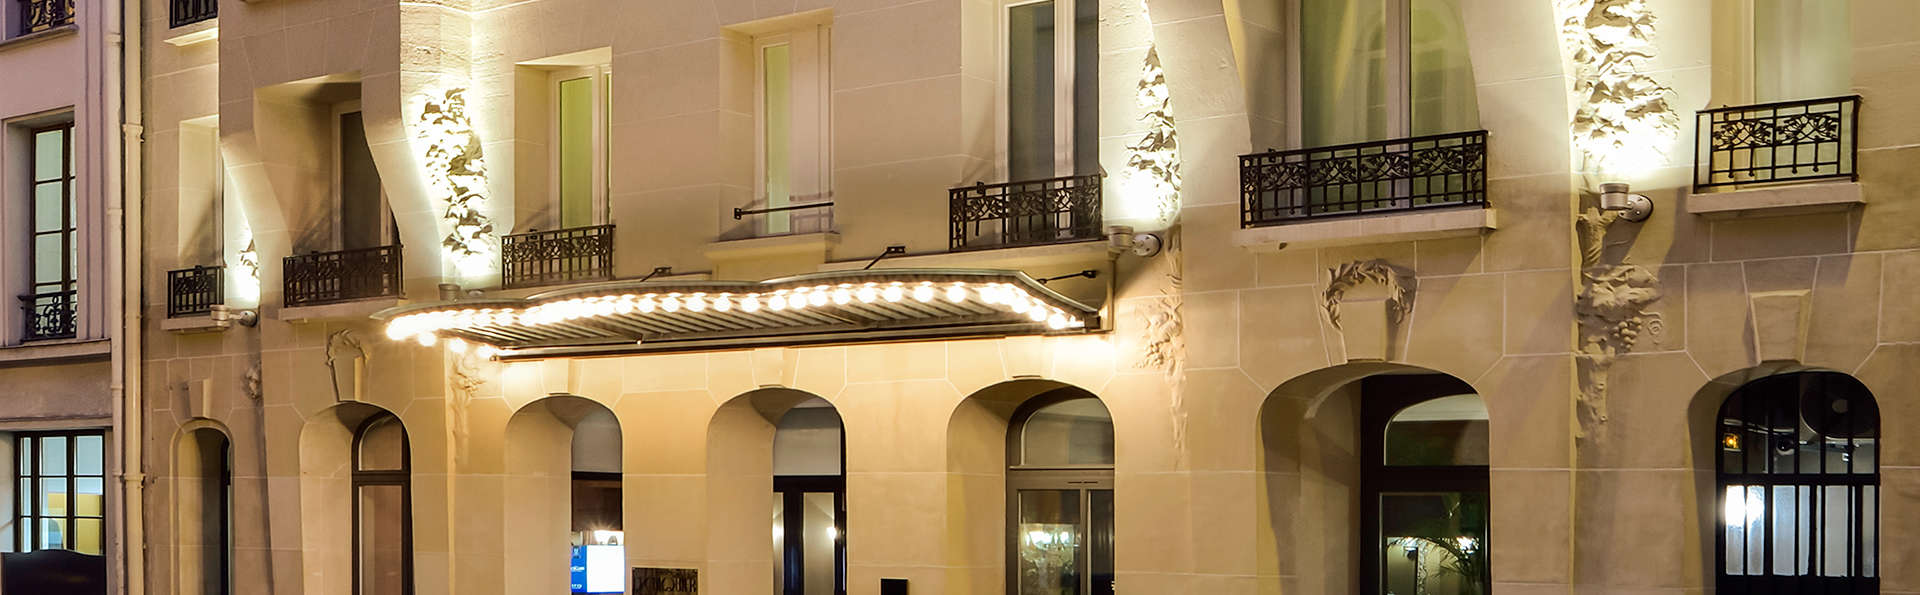 MGallery l'Echiquier Opéra Paris - EDIT_front1.jpg